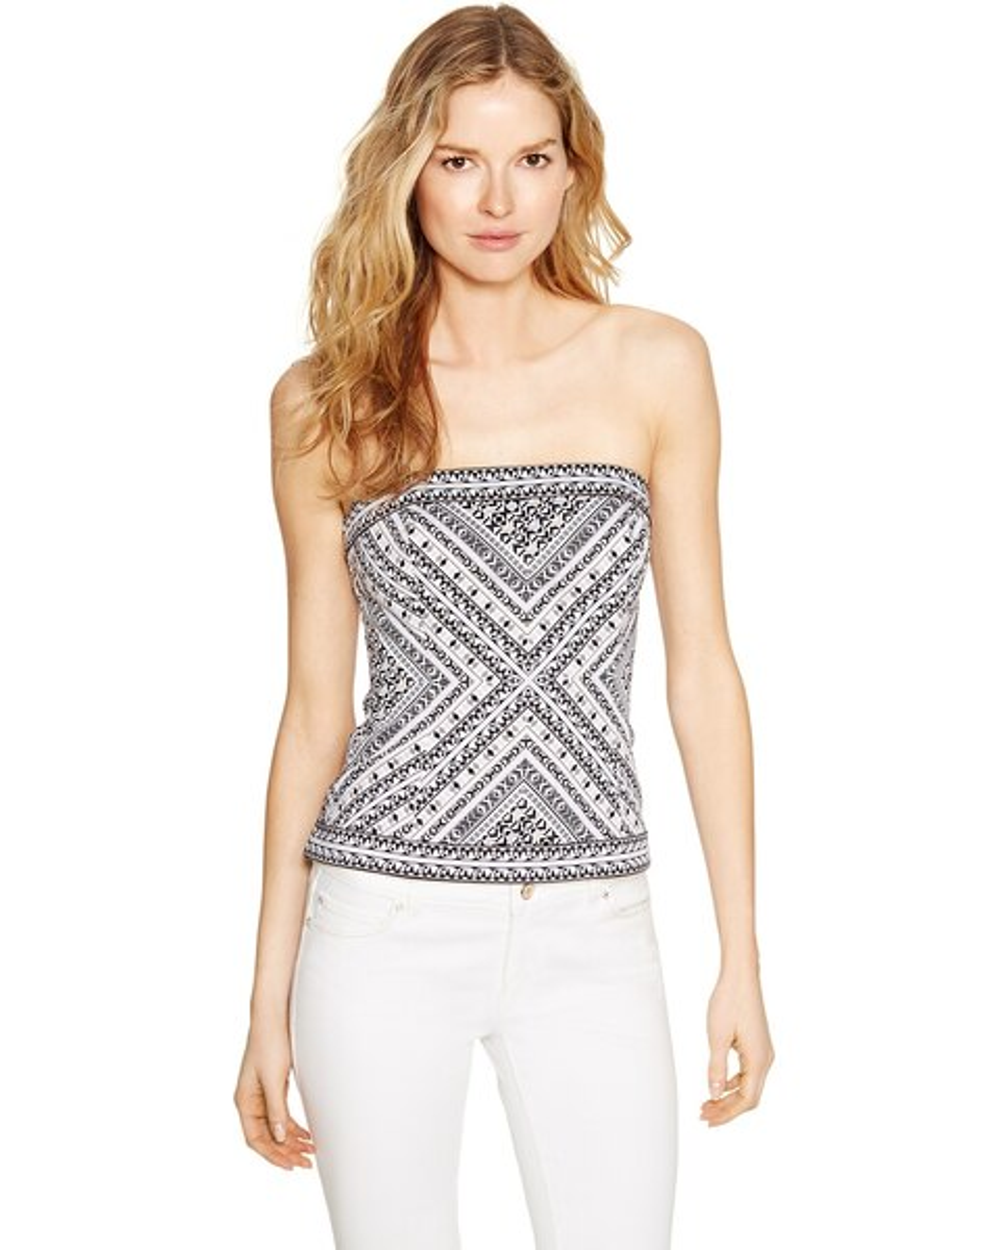 Women Clubwear Sexy Leopard Printed Corset Vest Bustier ... |Printed Bustier Top